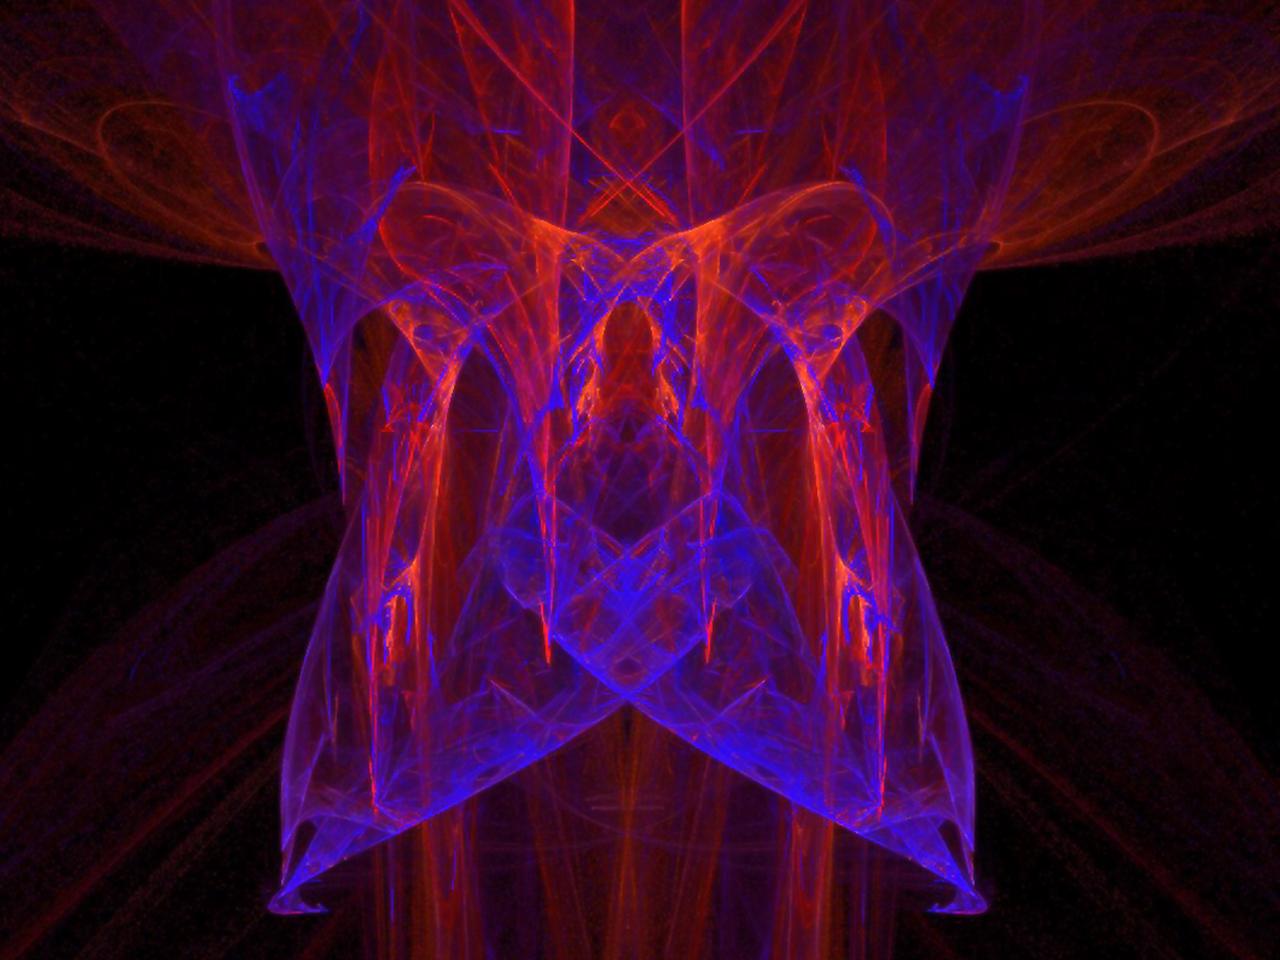 Gothic Fractals by DeepChrome